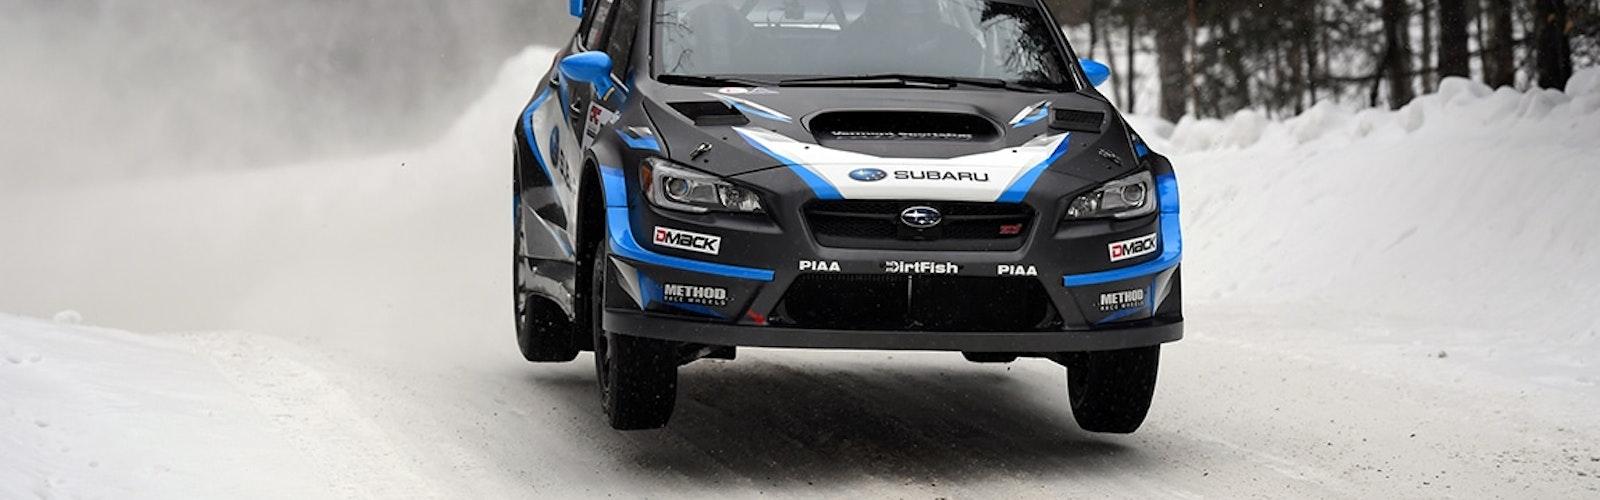 David Higgins Rallye Perce Neige 2017